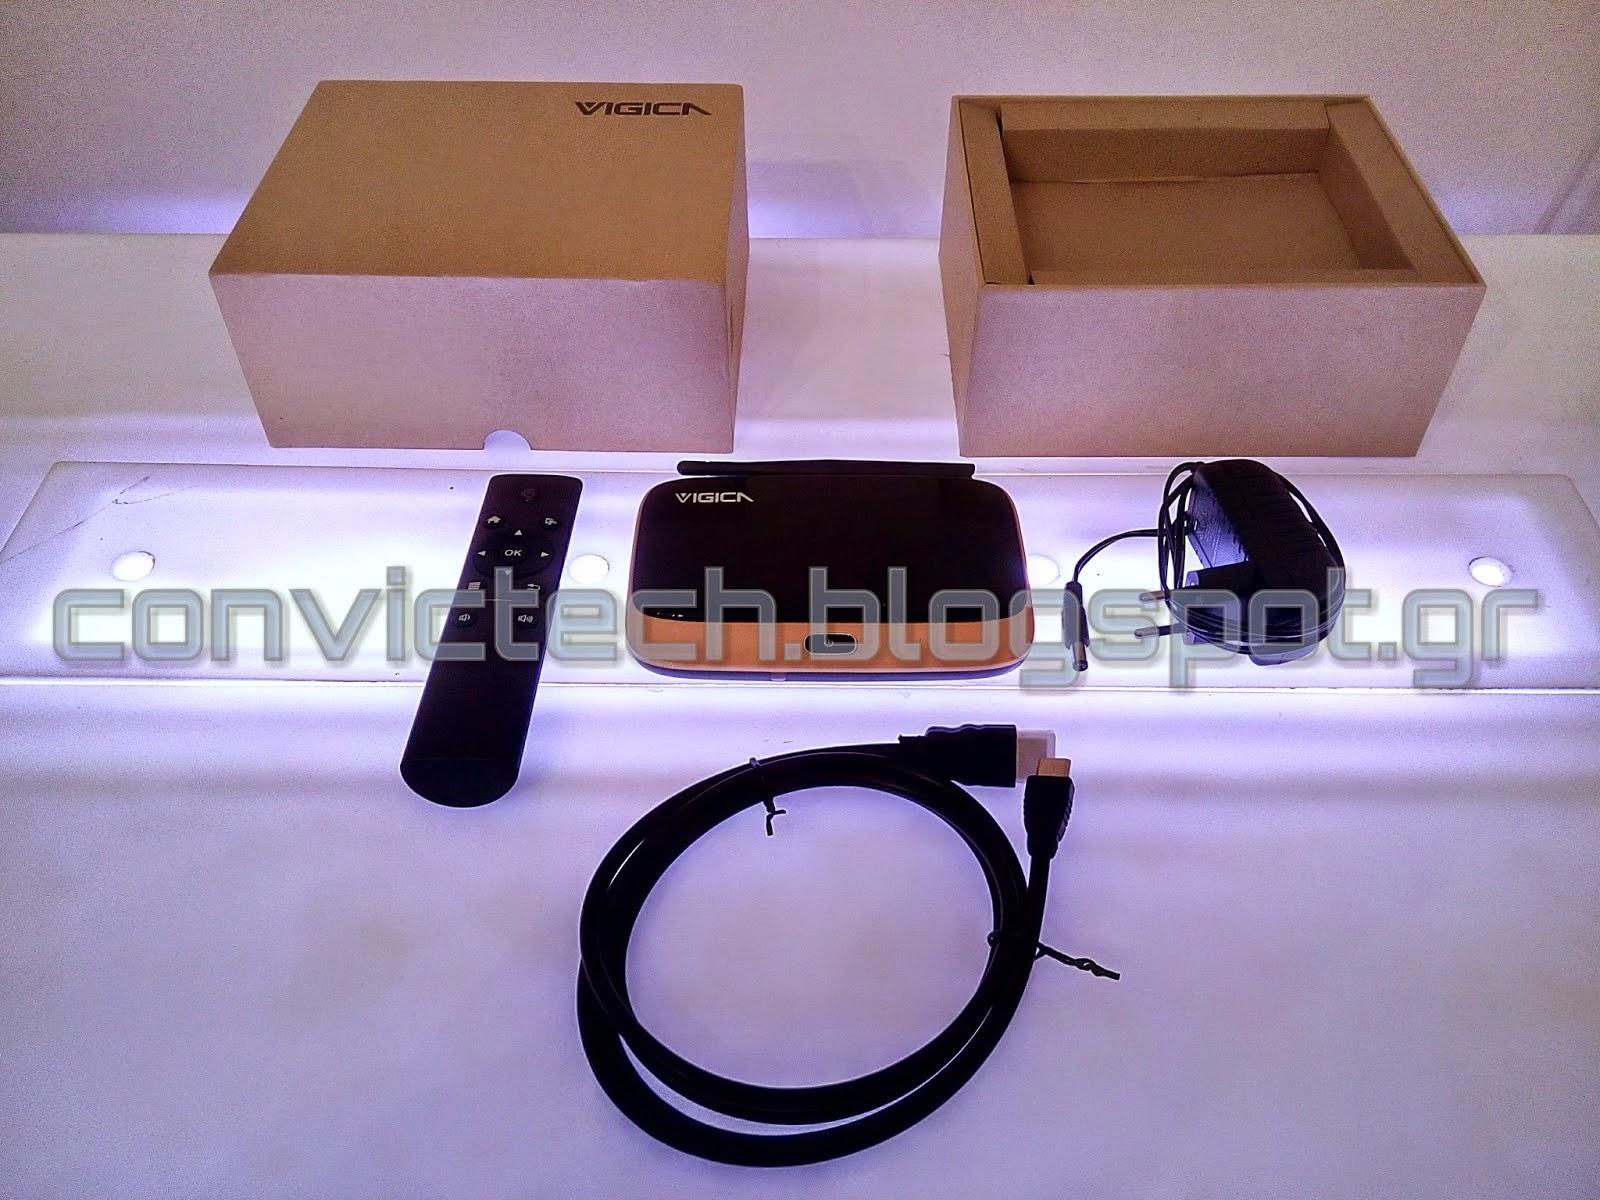 Android TV Box, Smart IPTV Box: Review of the Vigica V3 RK3288 Quad